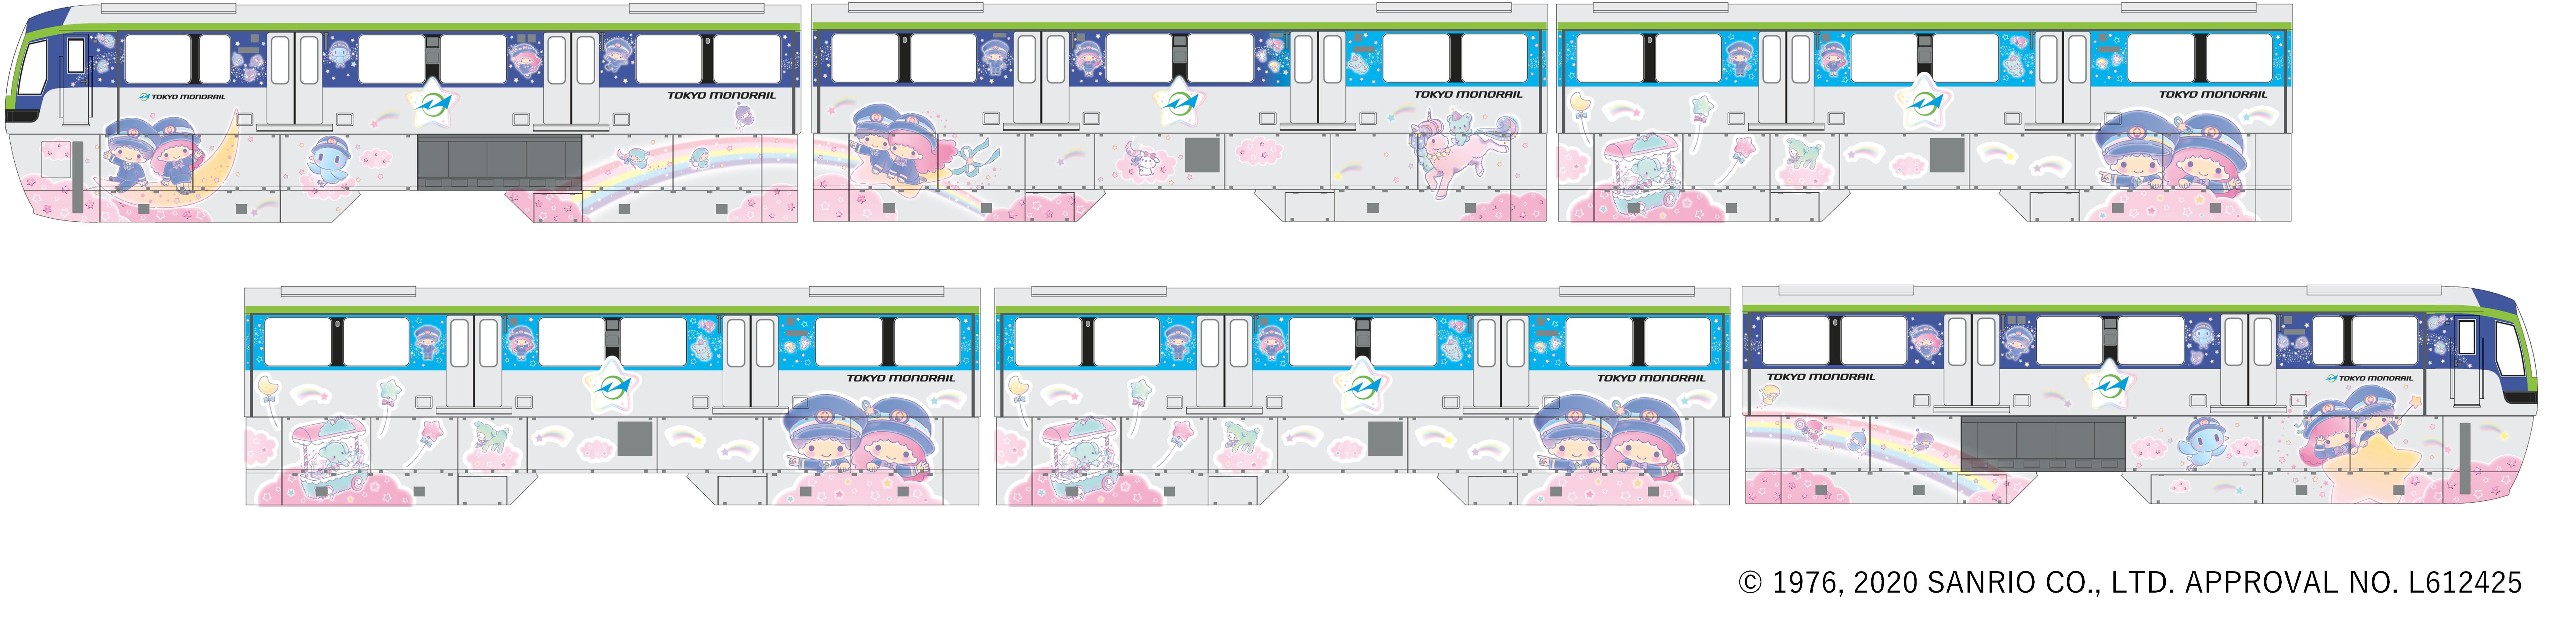 ©1976, 2020 SANRIO CO., LTD.Ⓗ ©2020 Tokyo Monorail/dwarf